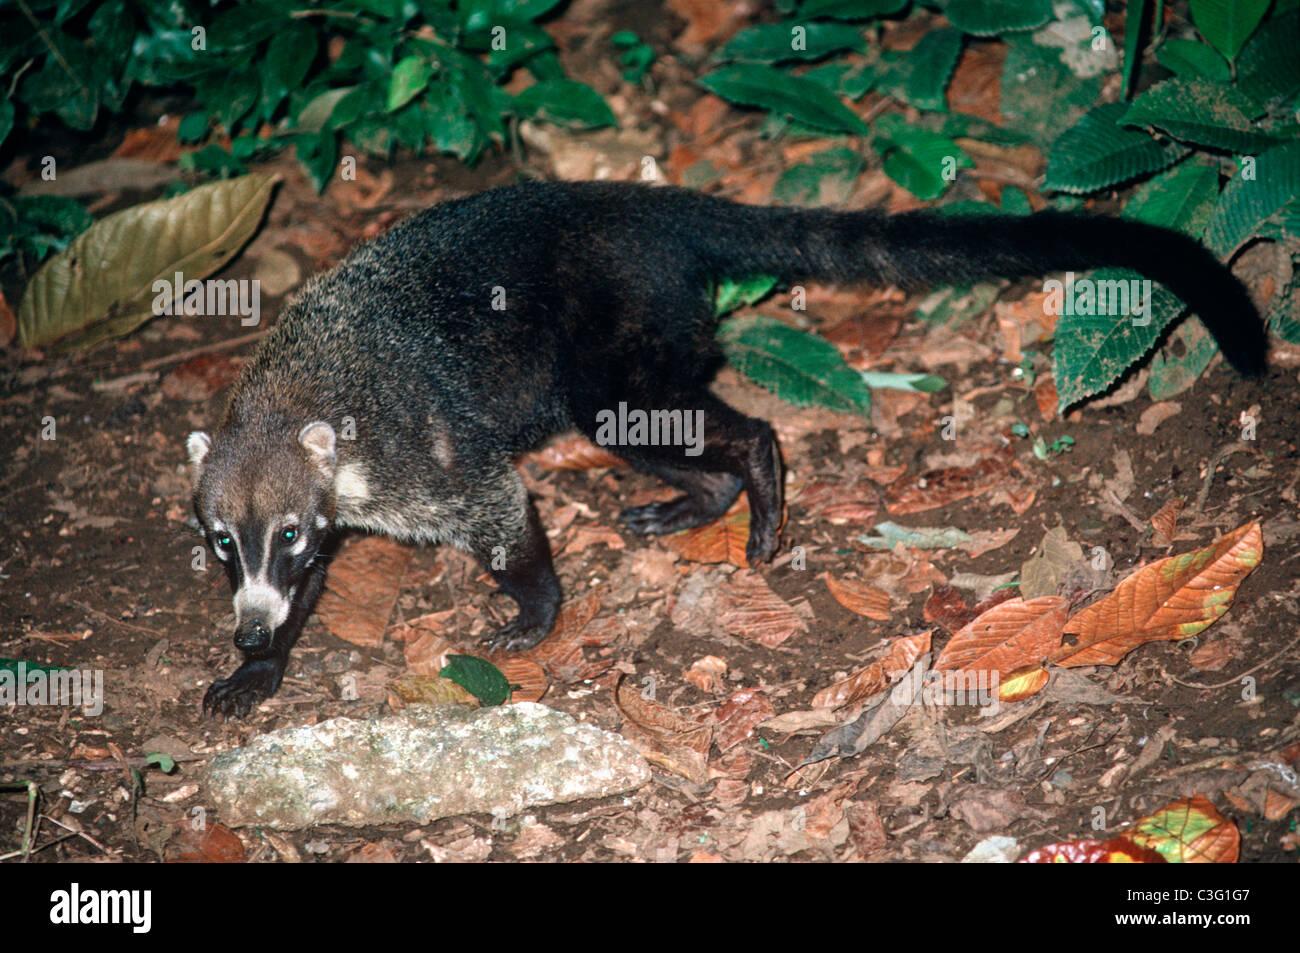 Procyonidae Animals Stock Photos & Procyonidae Animals Stock